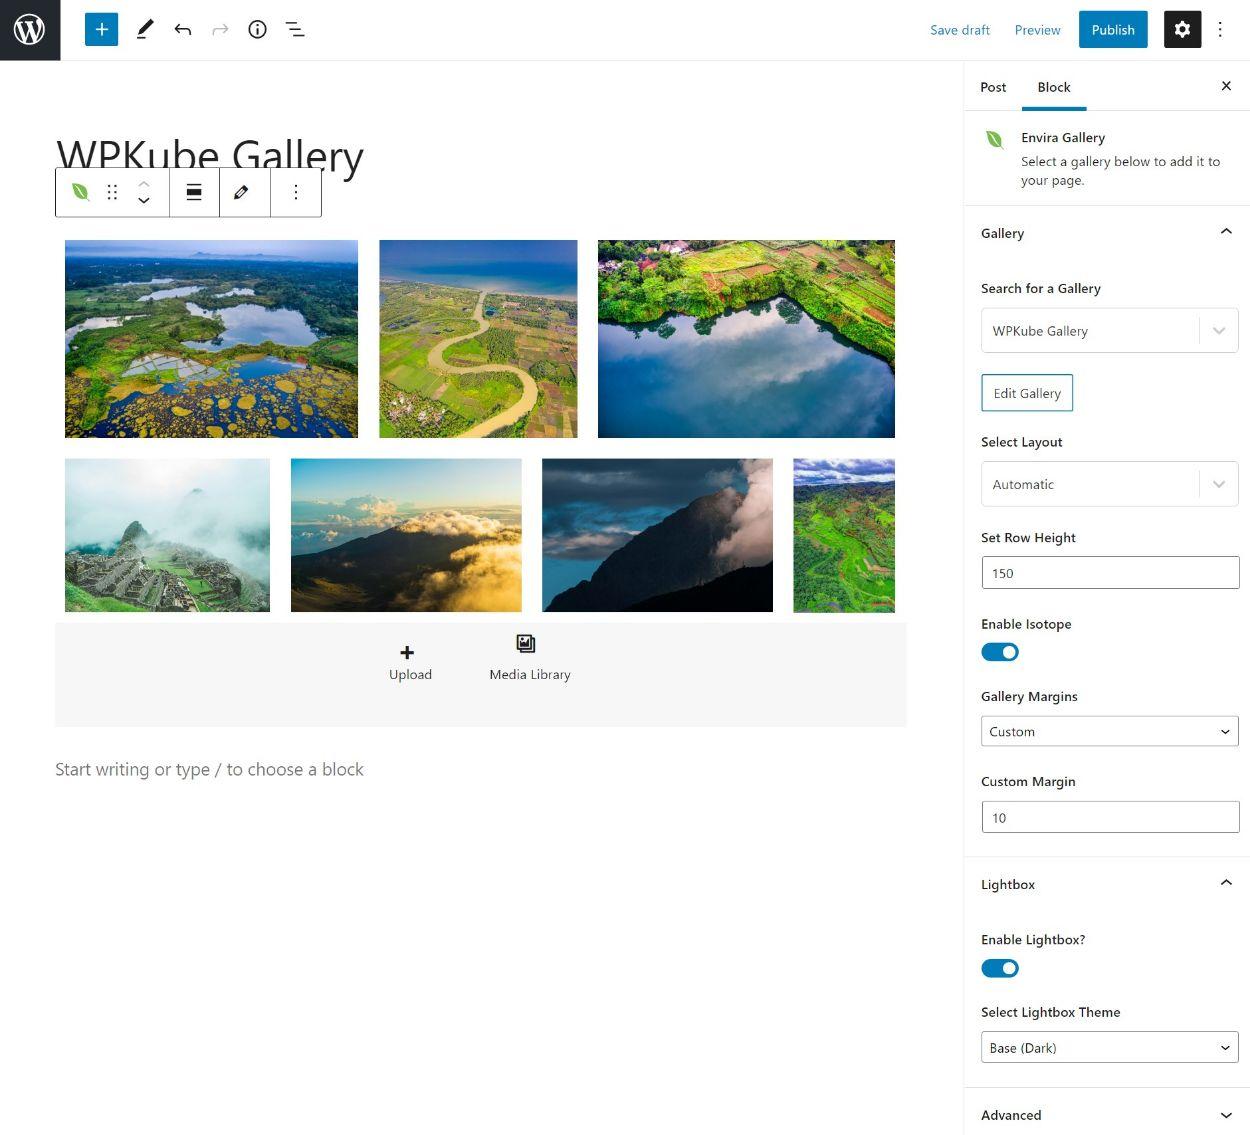 Envira Gallery block